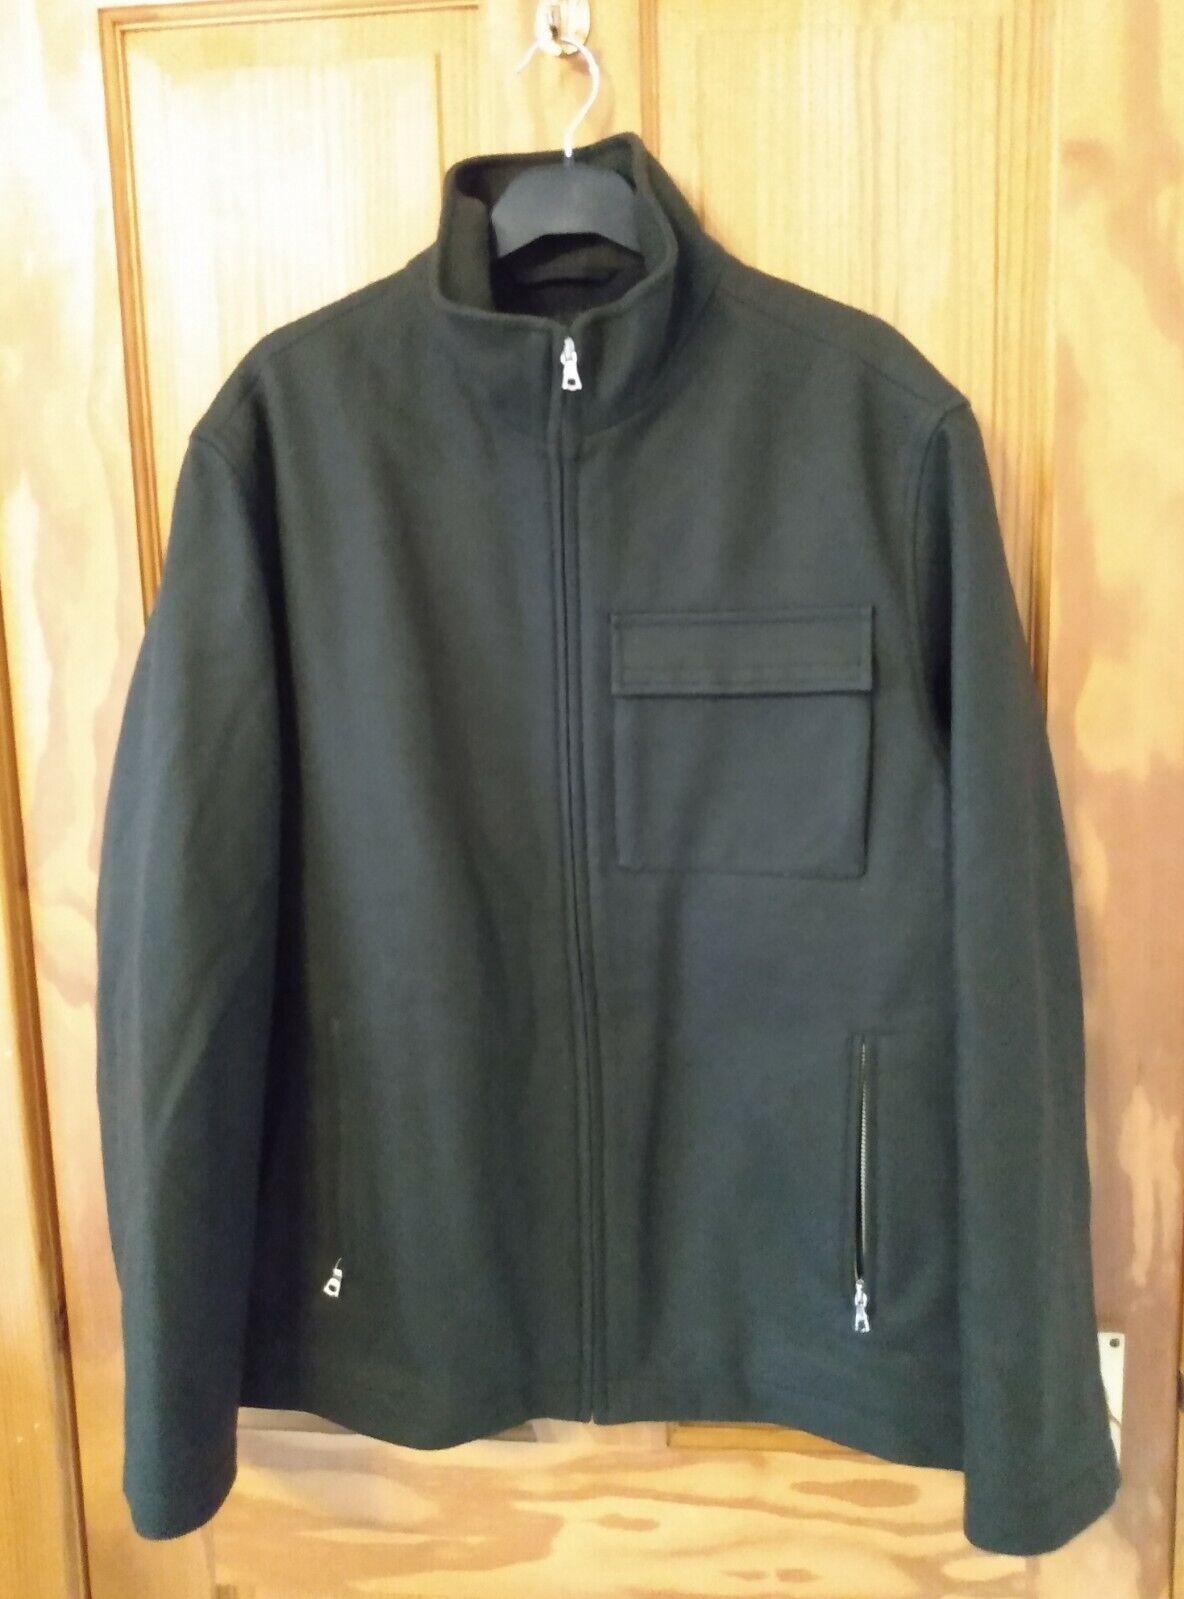 Wool Jacket Overshirt Bushcraft Green Coat Men's Small Swanndri alternative